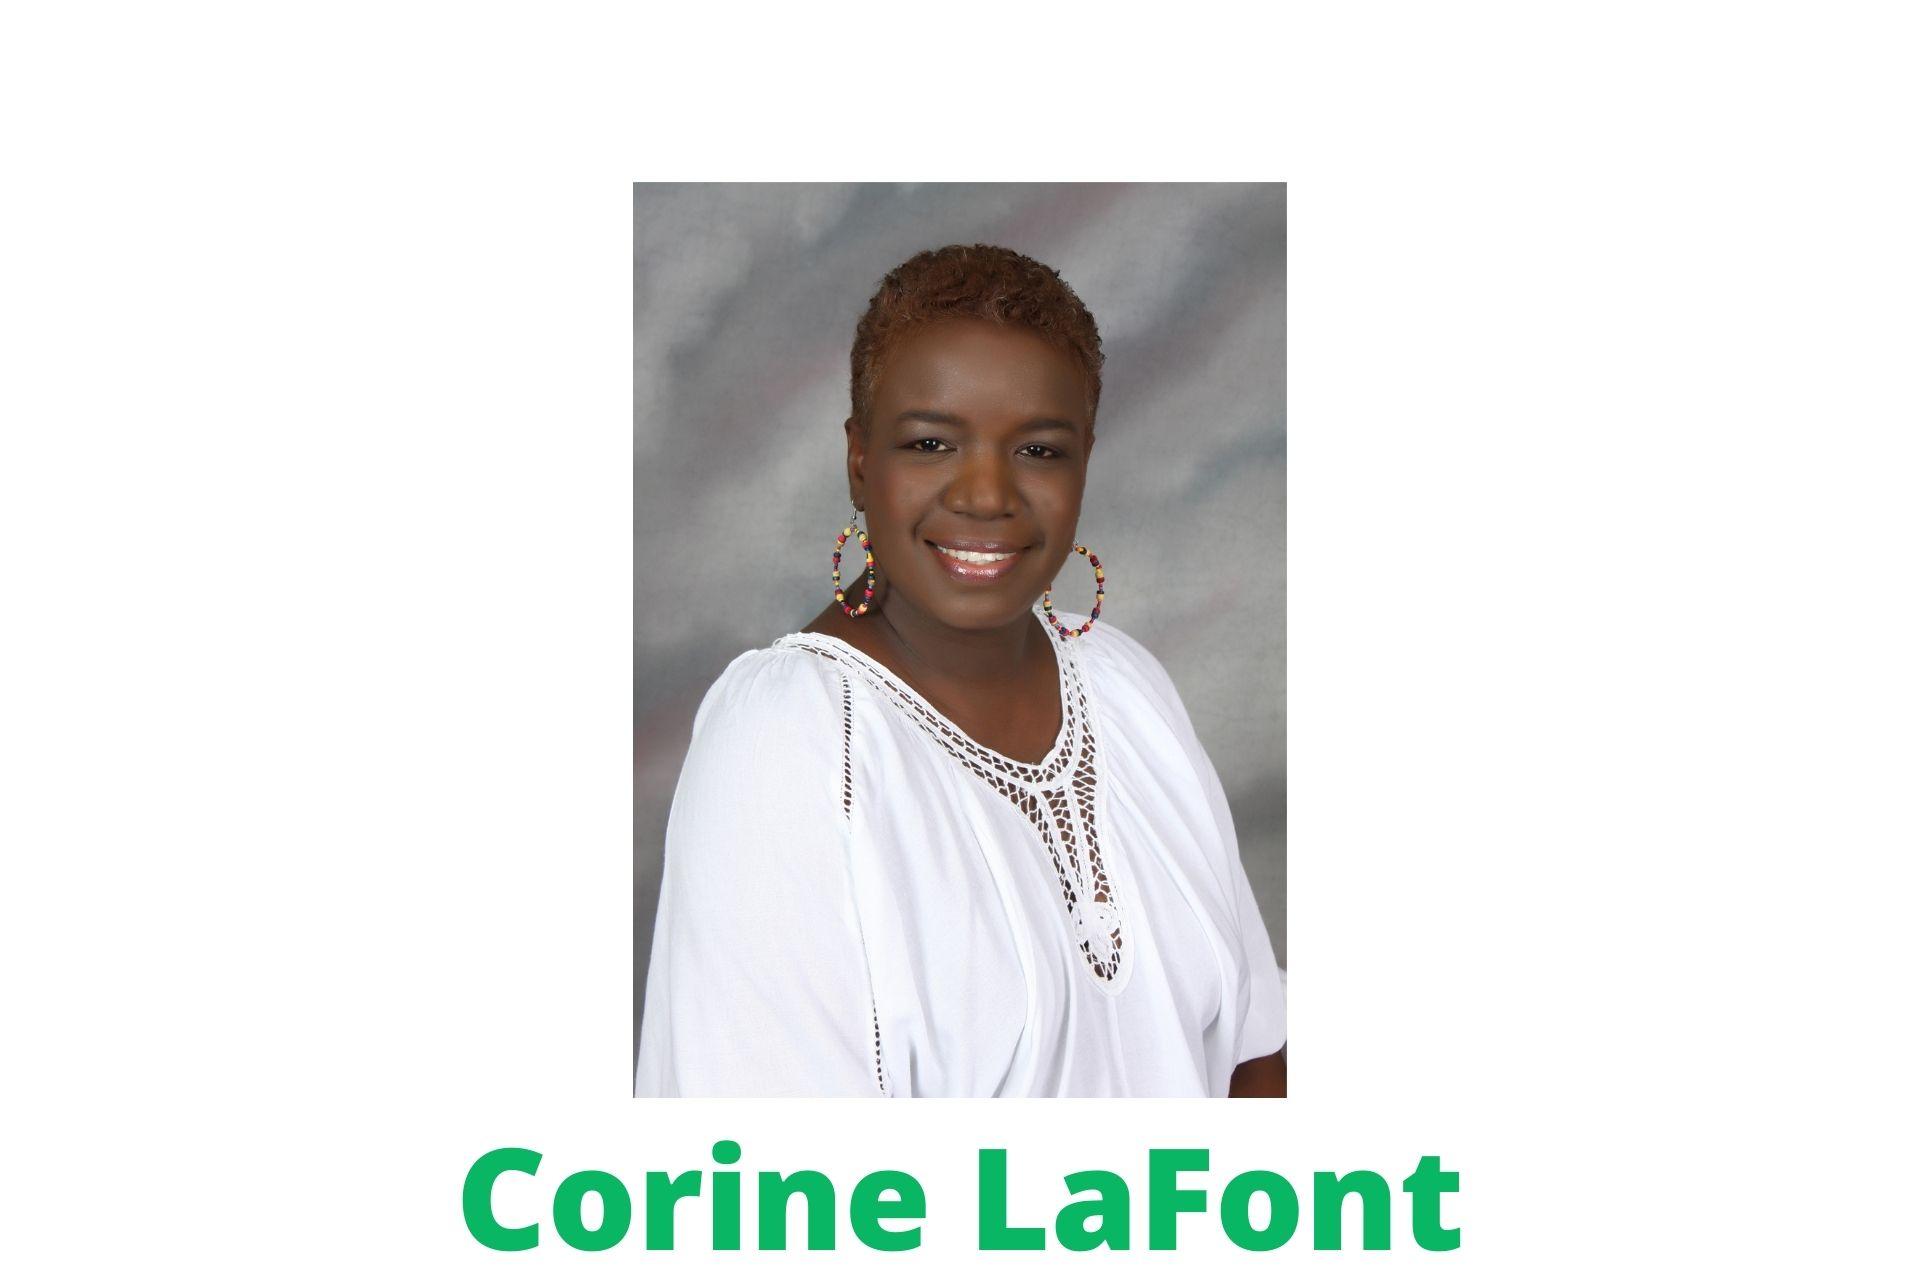 Corine LaFont